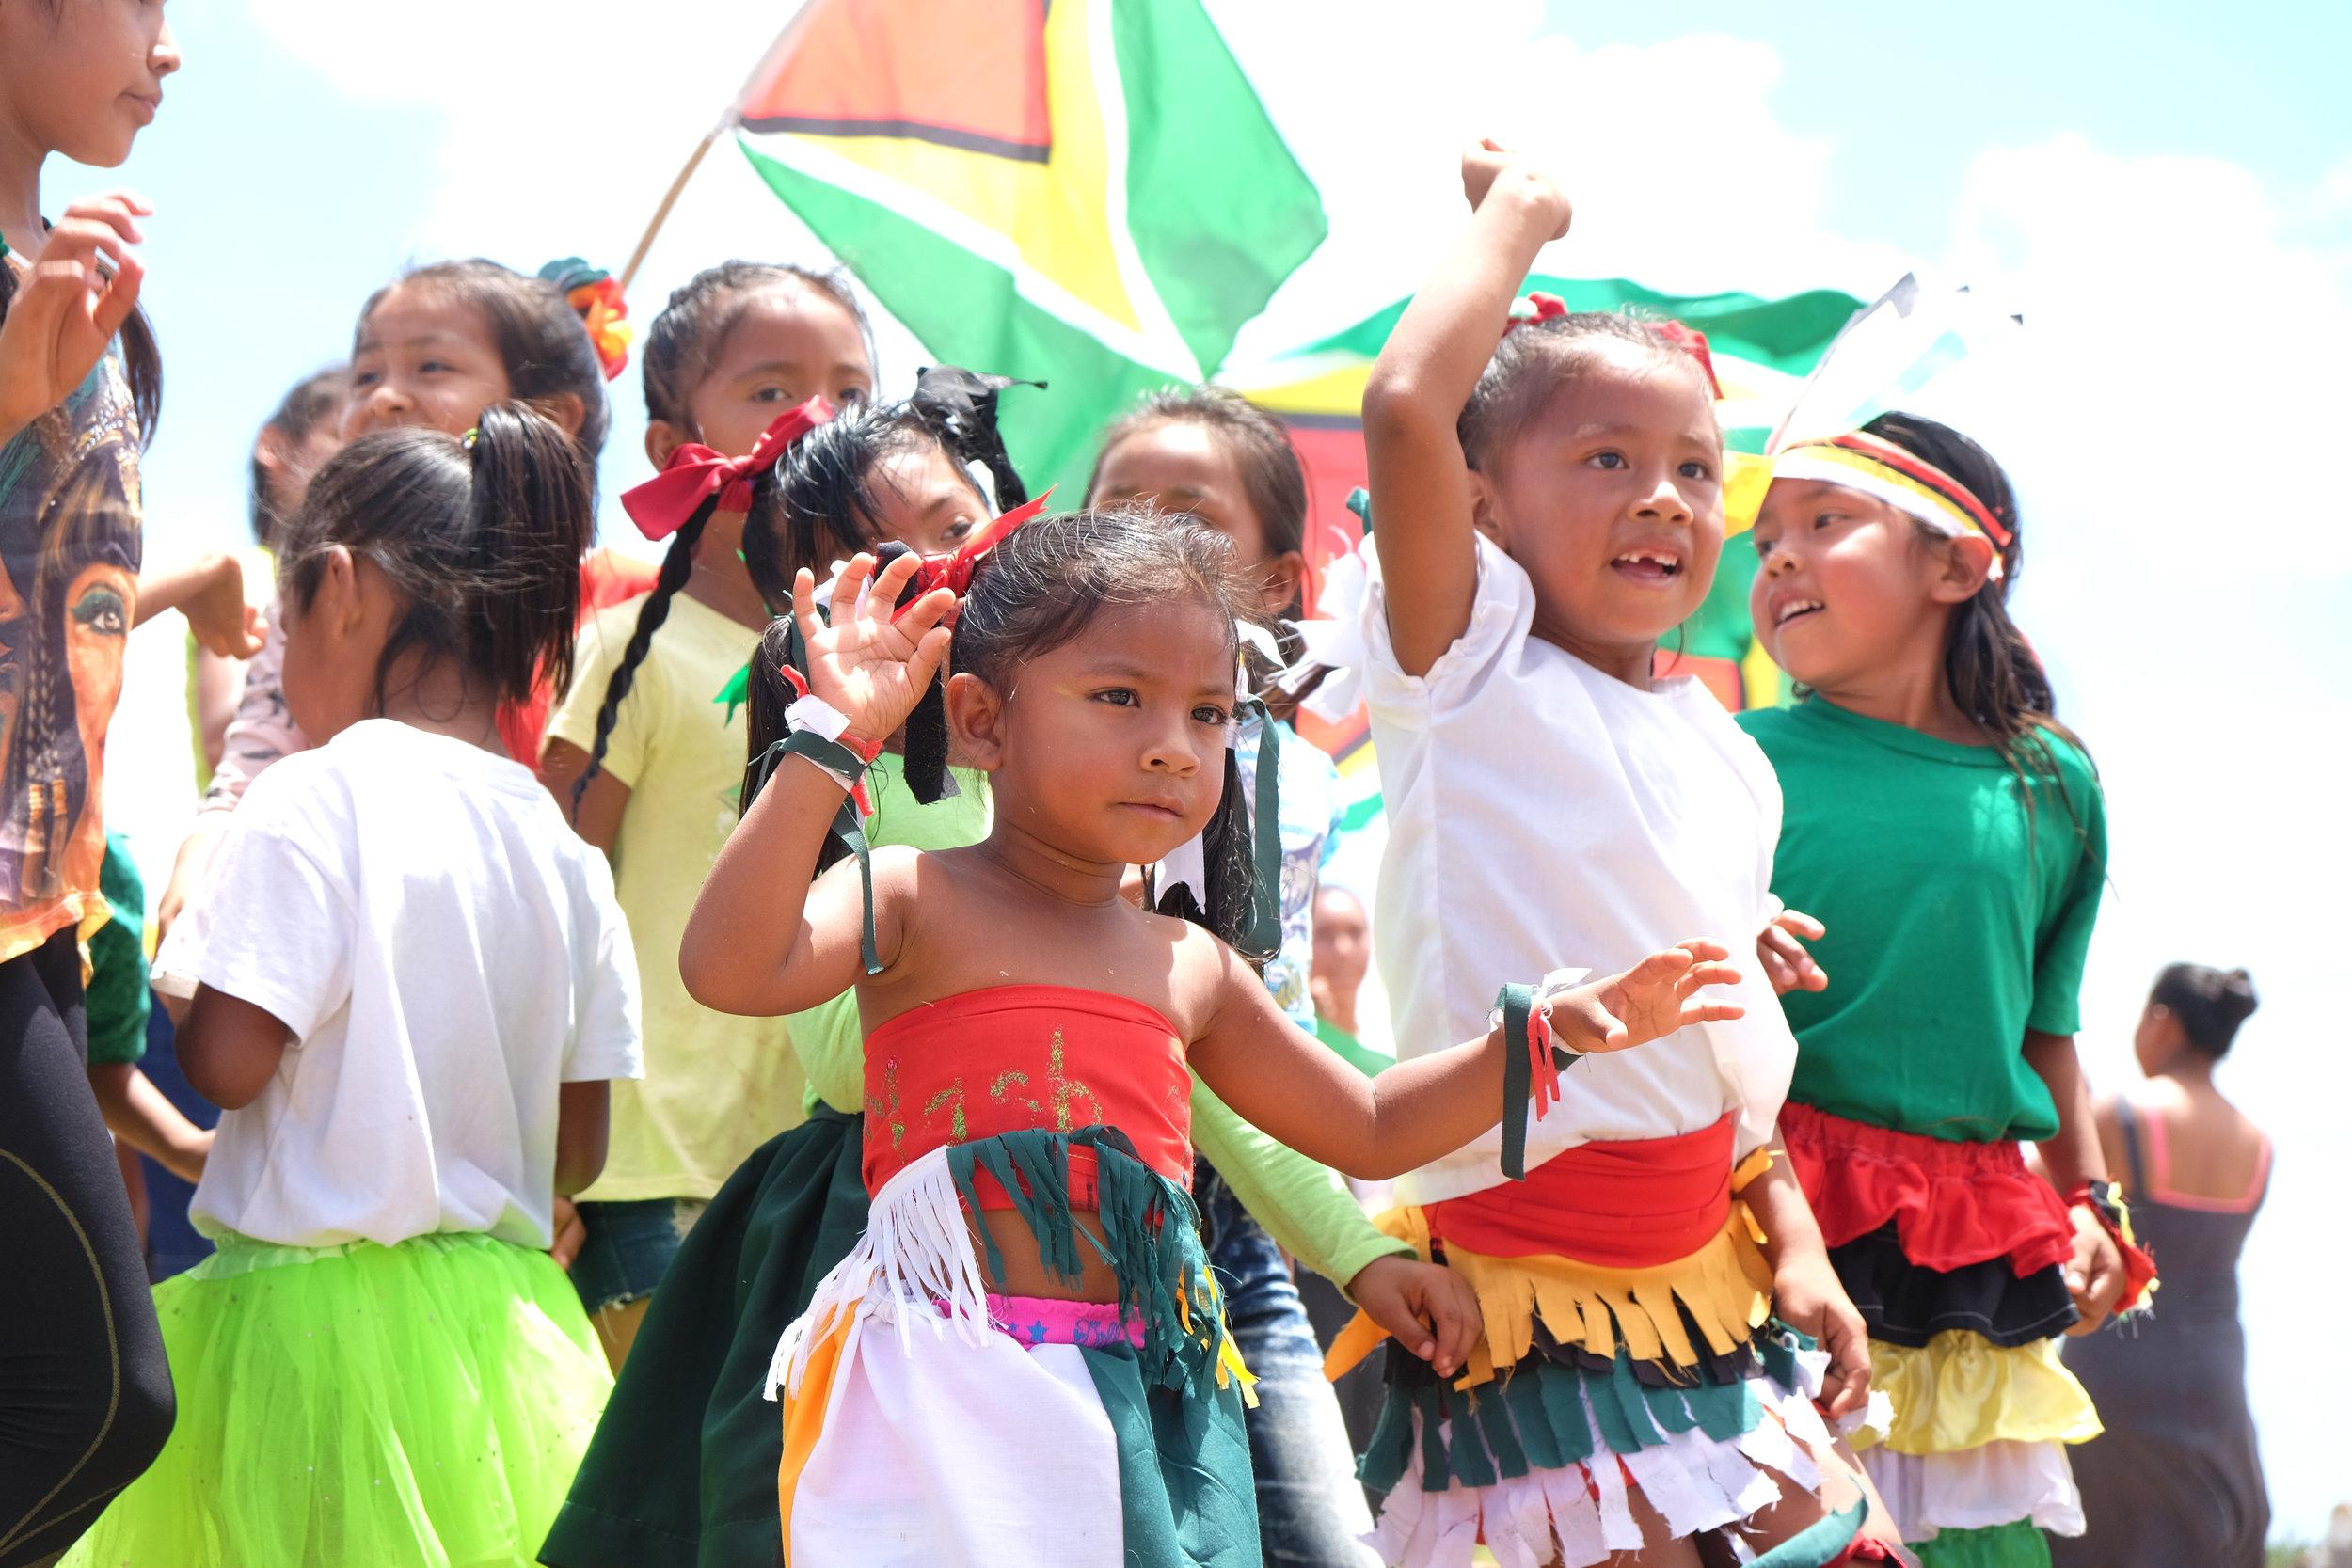 CHILDREN DANCING DURING MASHRAMANI (REPUBLIC DAY) FESTIVITIES IN THE RUPUNUNI SAVANNAH